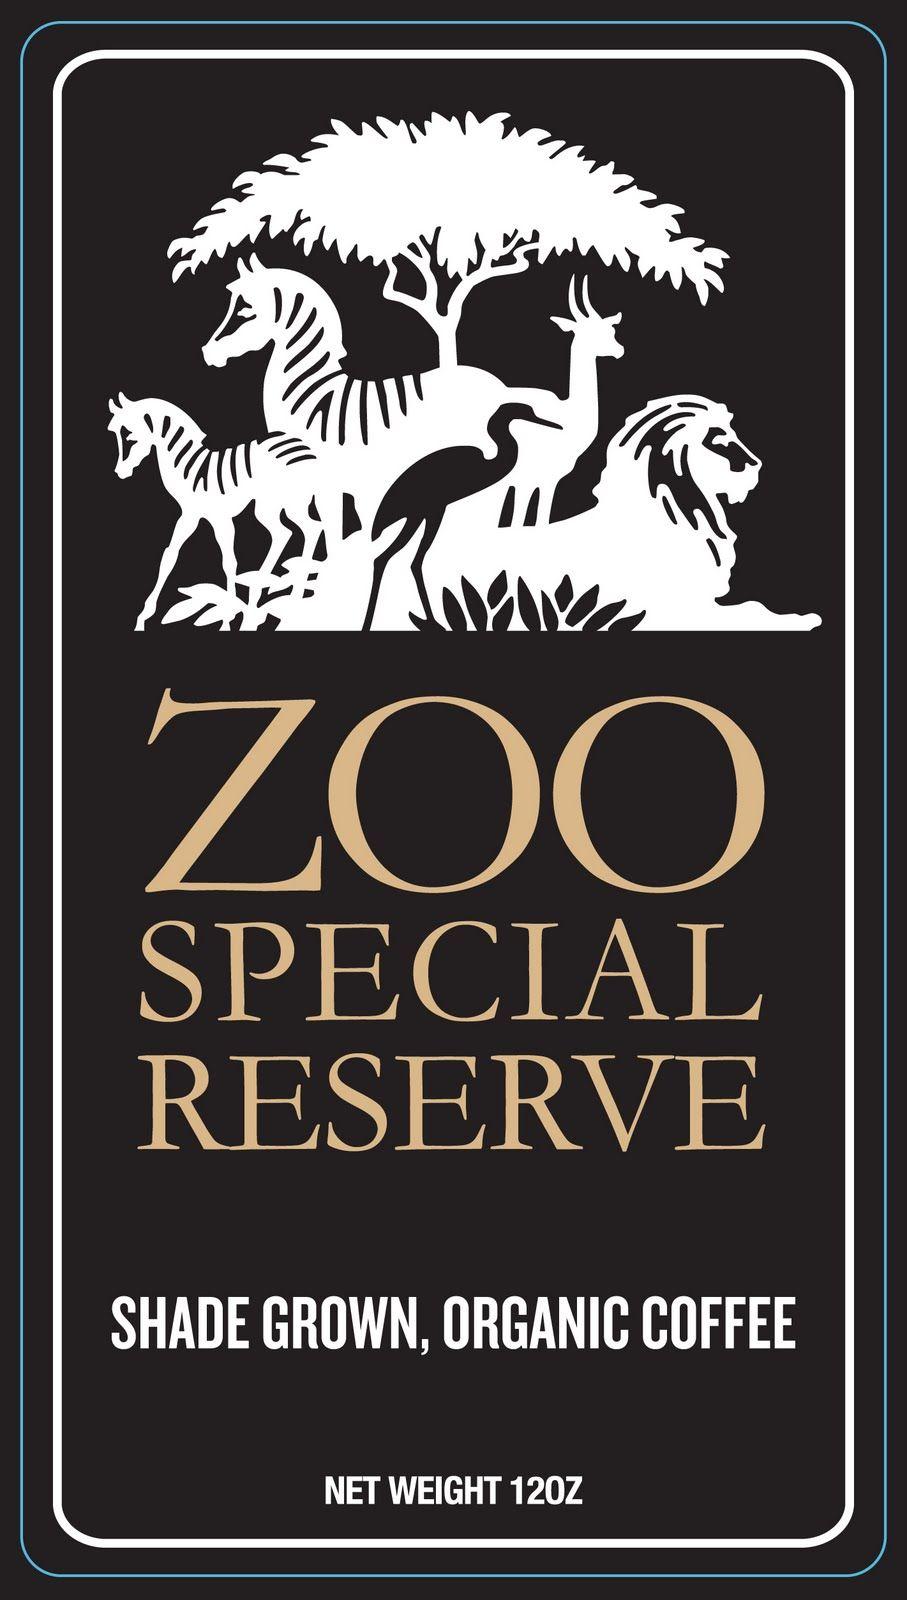 Woodland Park Zoo Logo Google Search Zoo Logo Jungle Queen Woodland Park Zoo